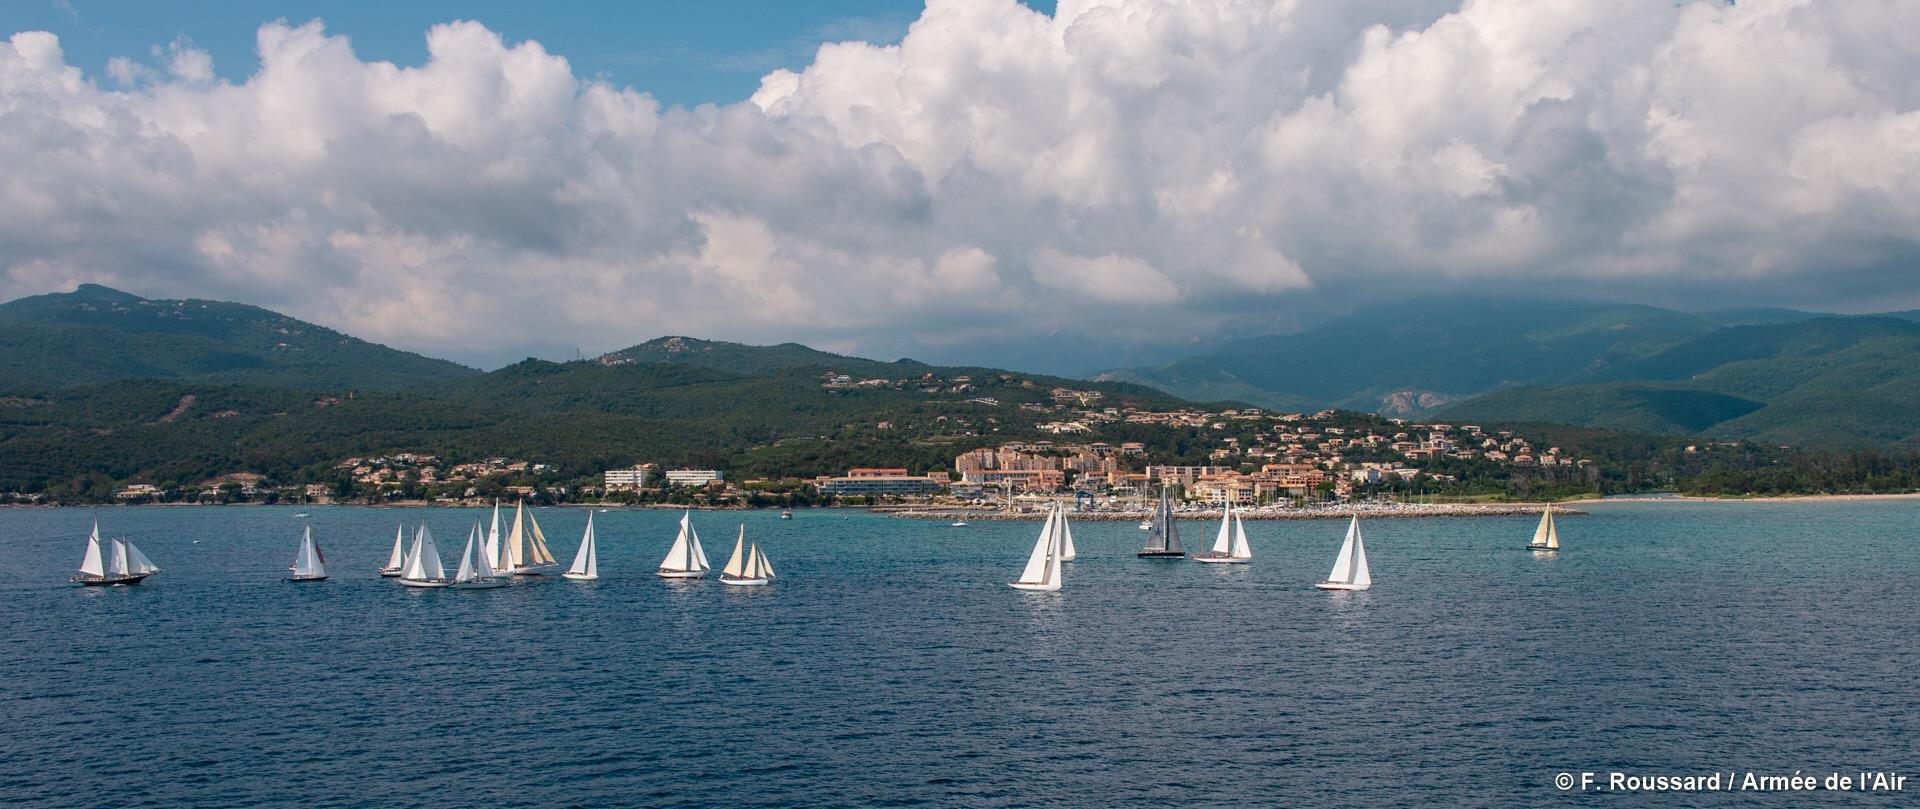 "CC 2019 Départ Sari-Solenzara - Bastia photo Florian Roussard ""Armée de l'Air"" DR"